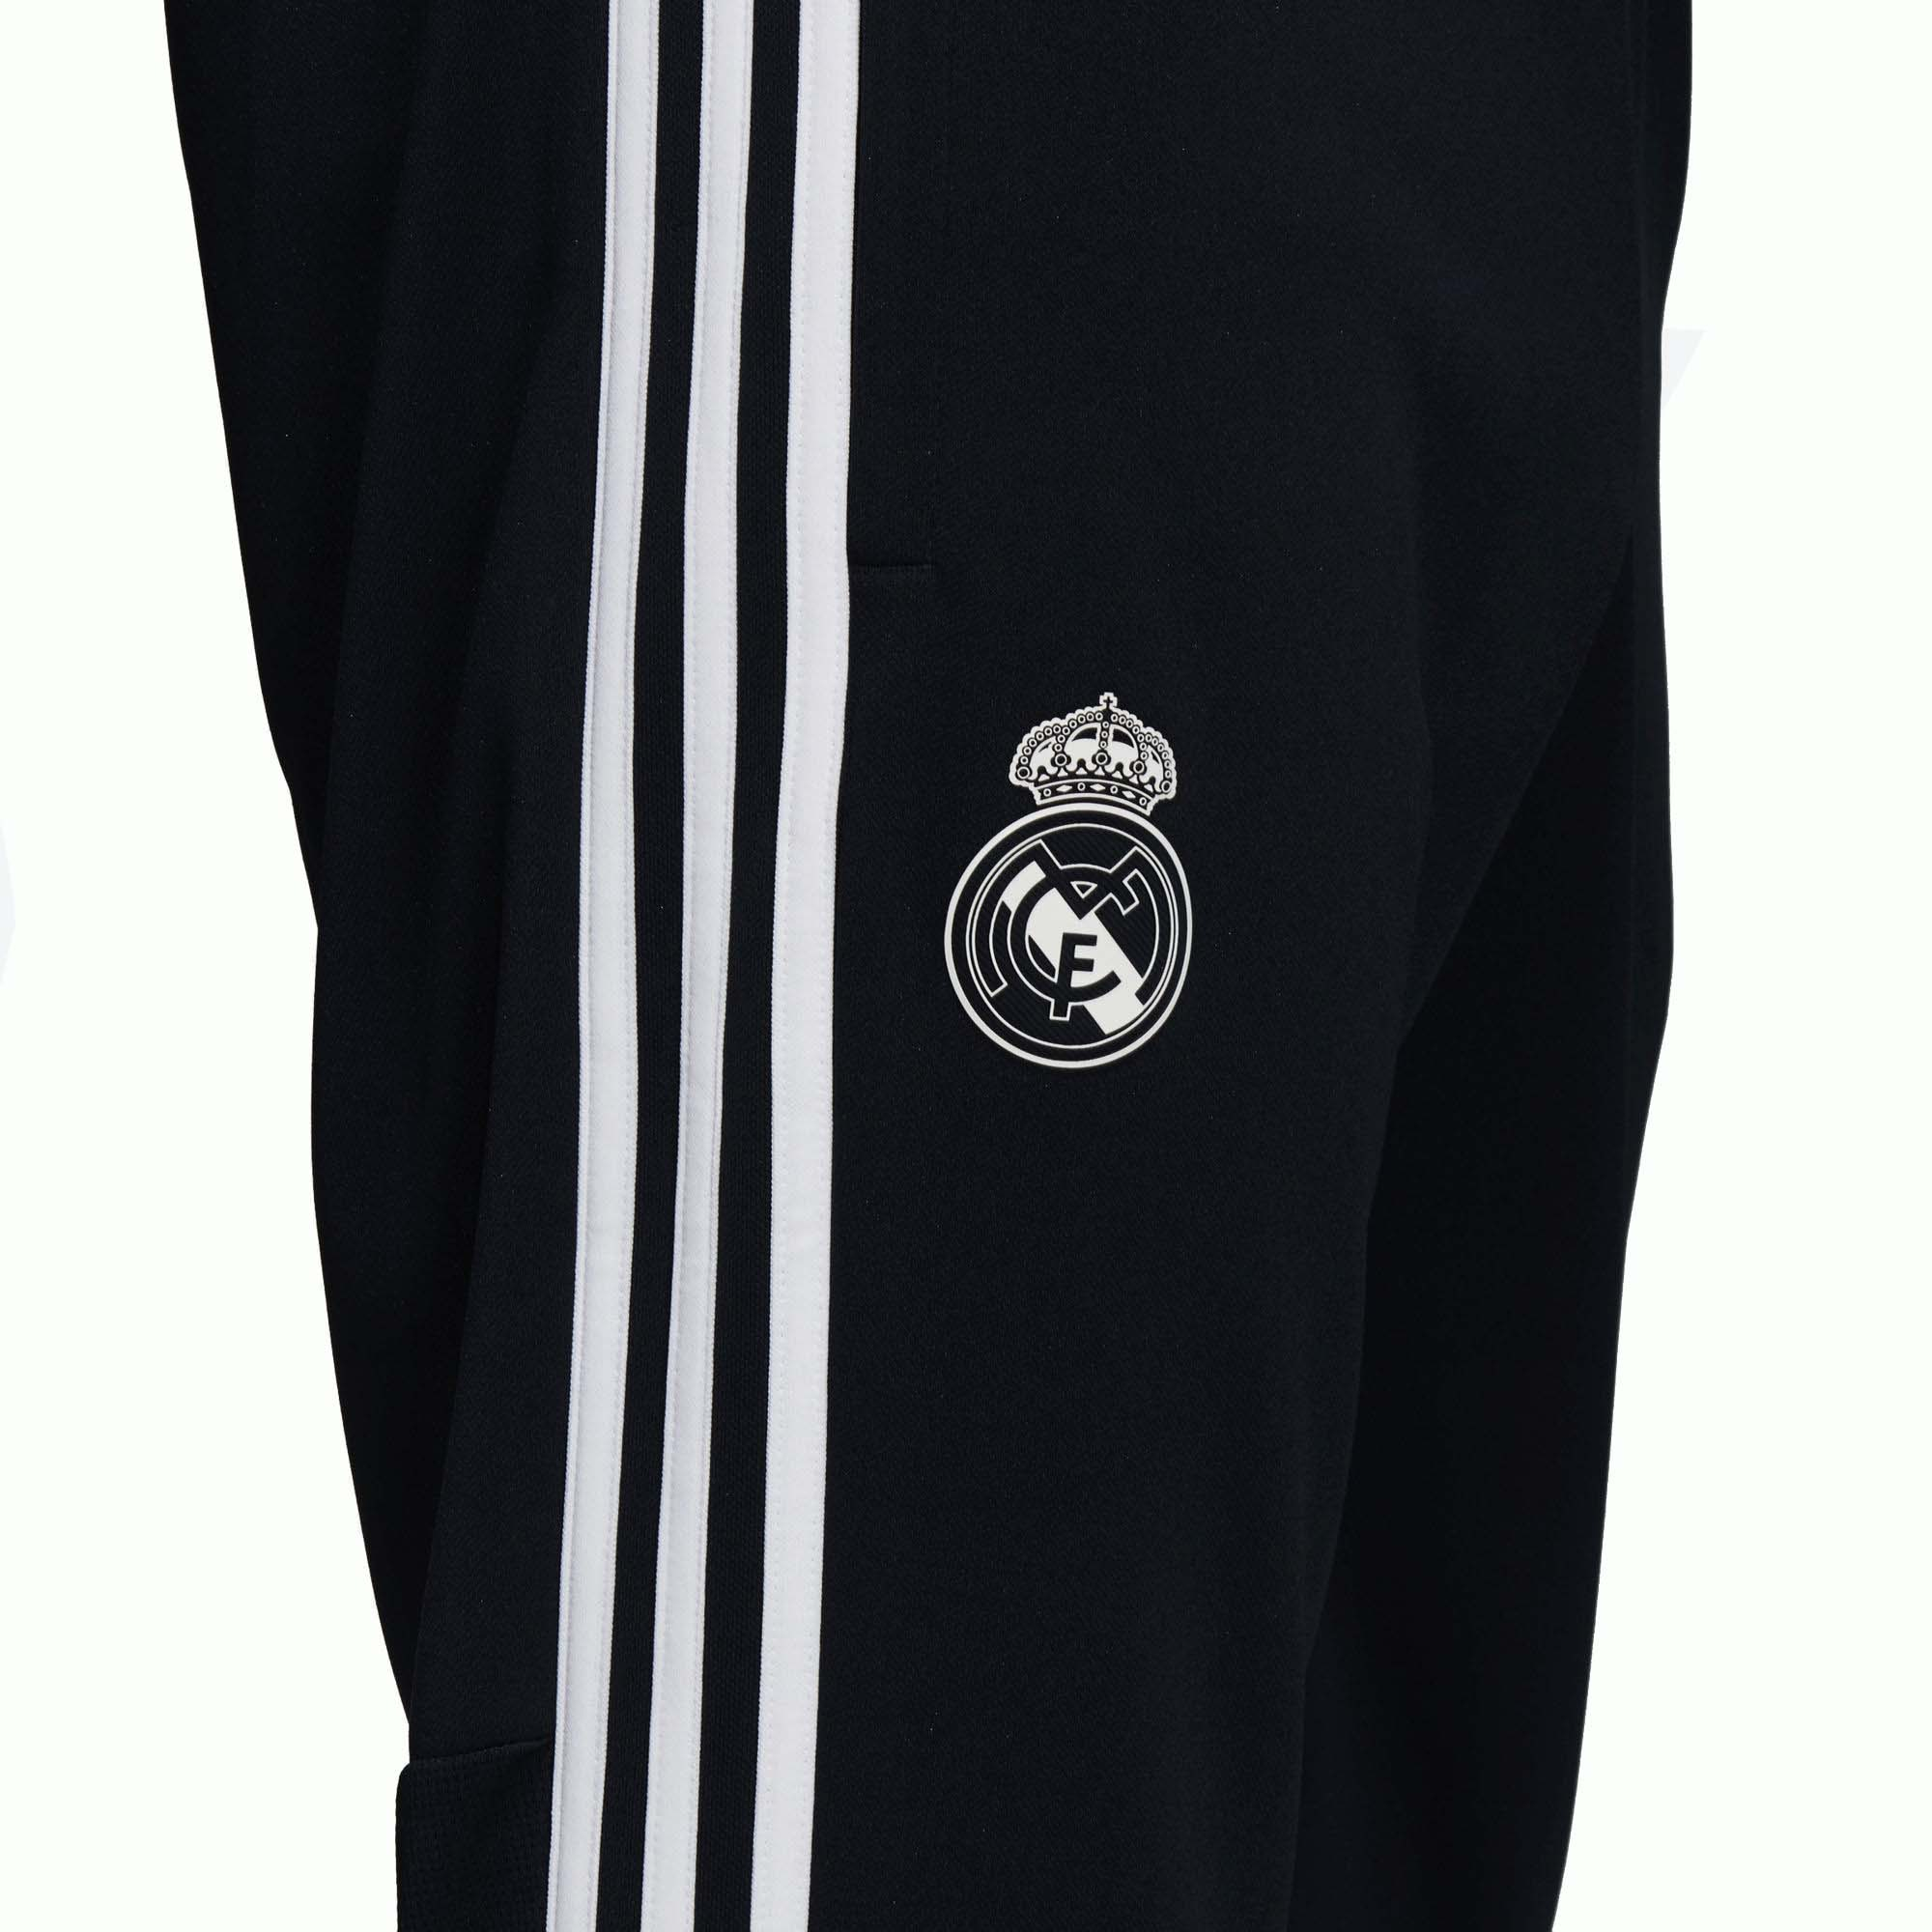 Pantalon Adidas Real Madrid Entrenamiento Azul Hombre Deporfan Hombre E Shop